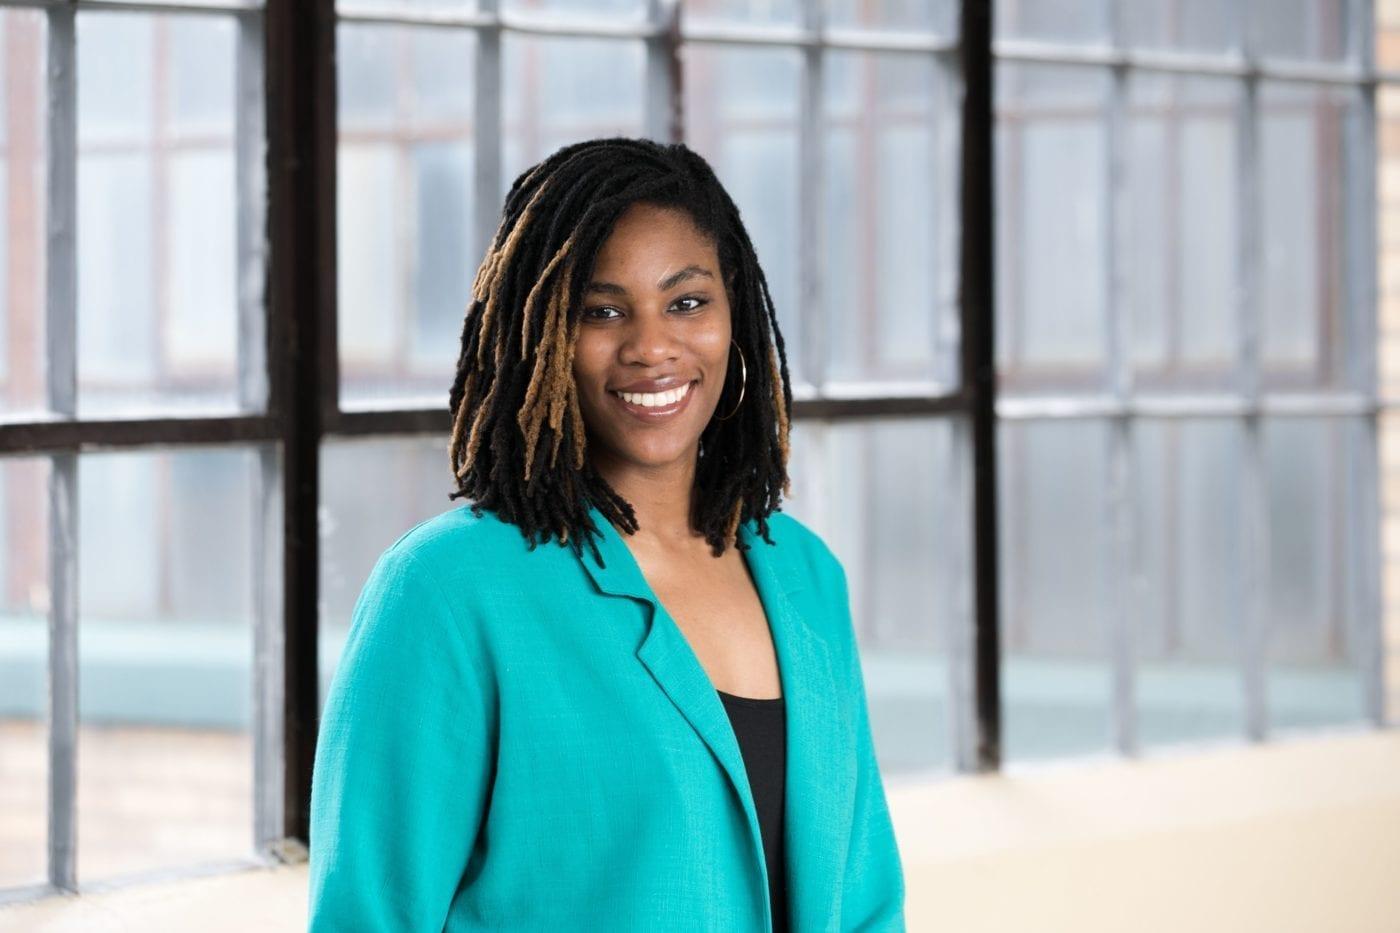 Kenzie Academy Celebrates Black History Month